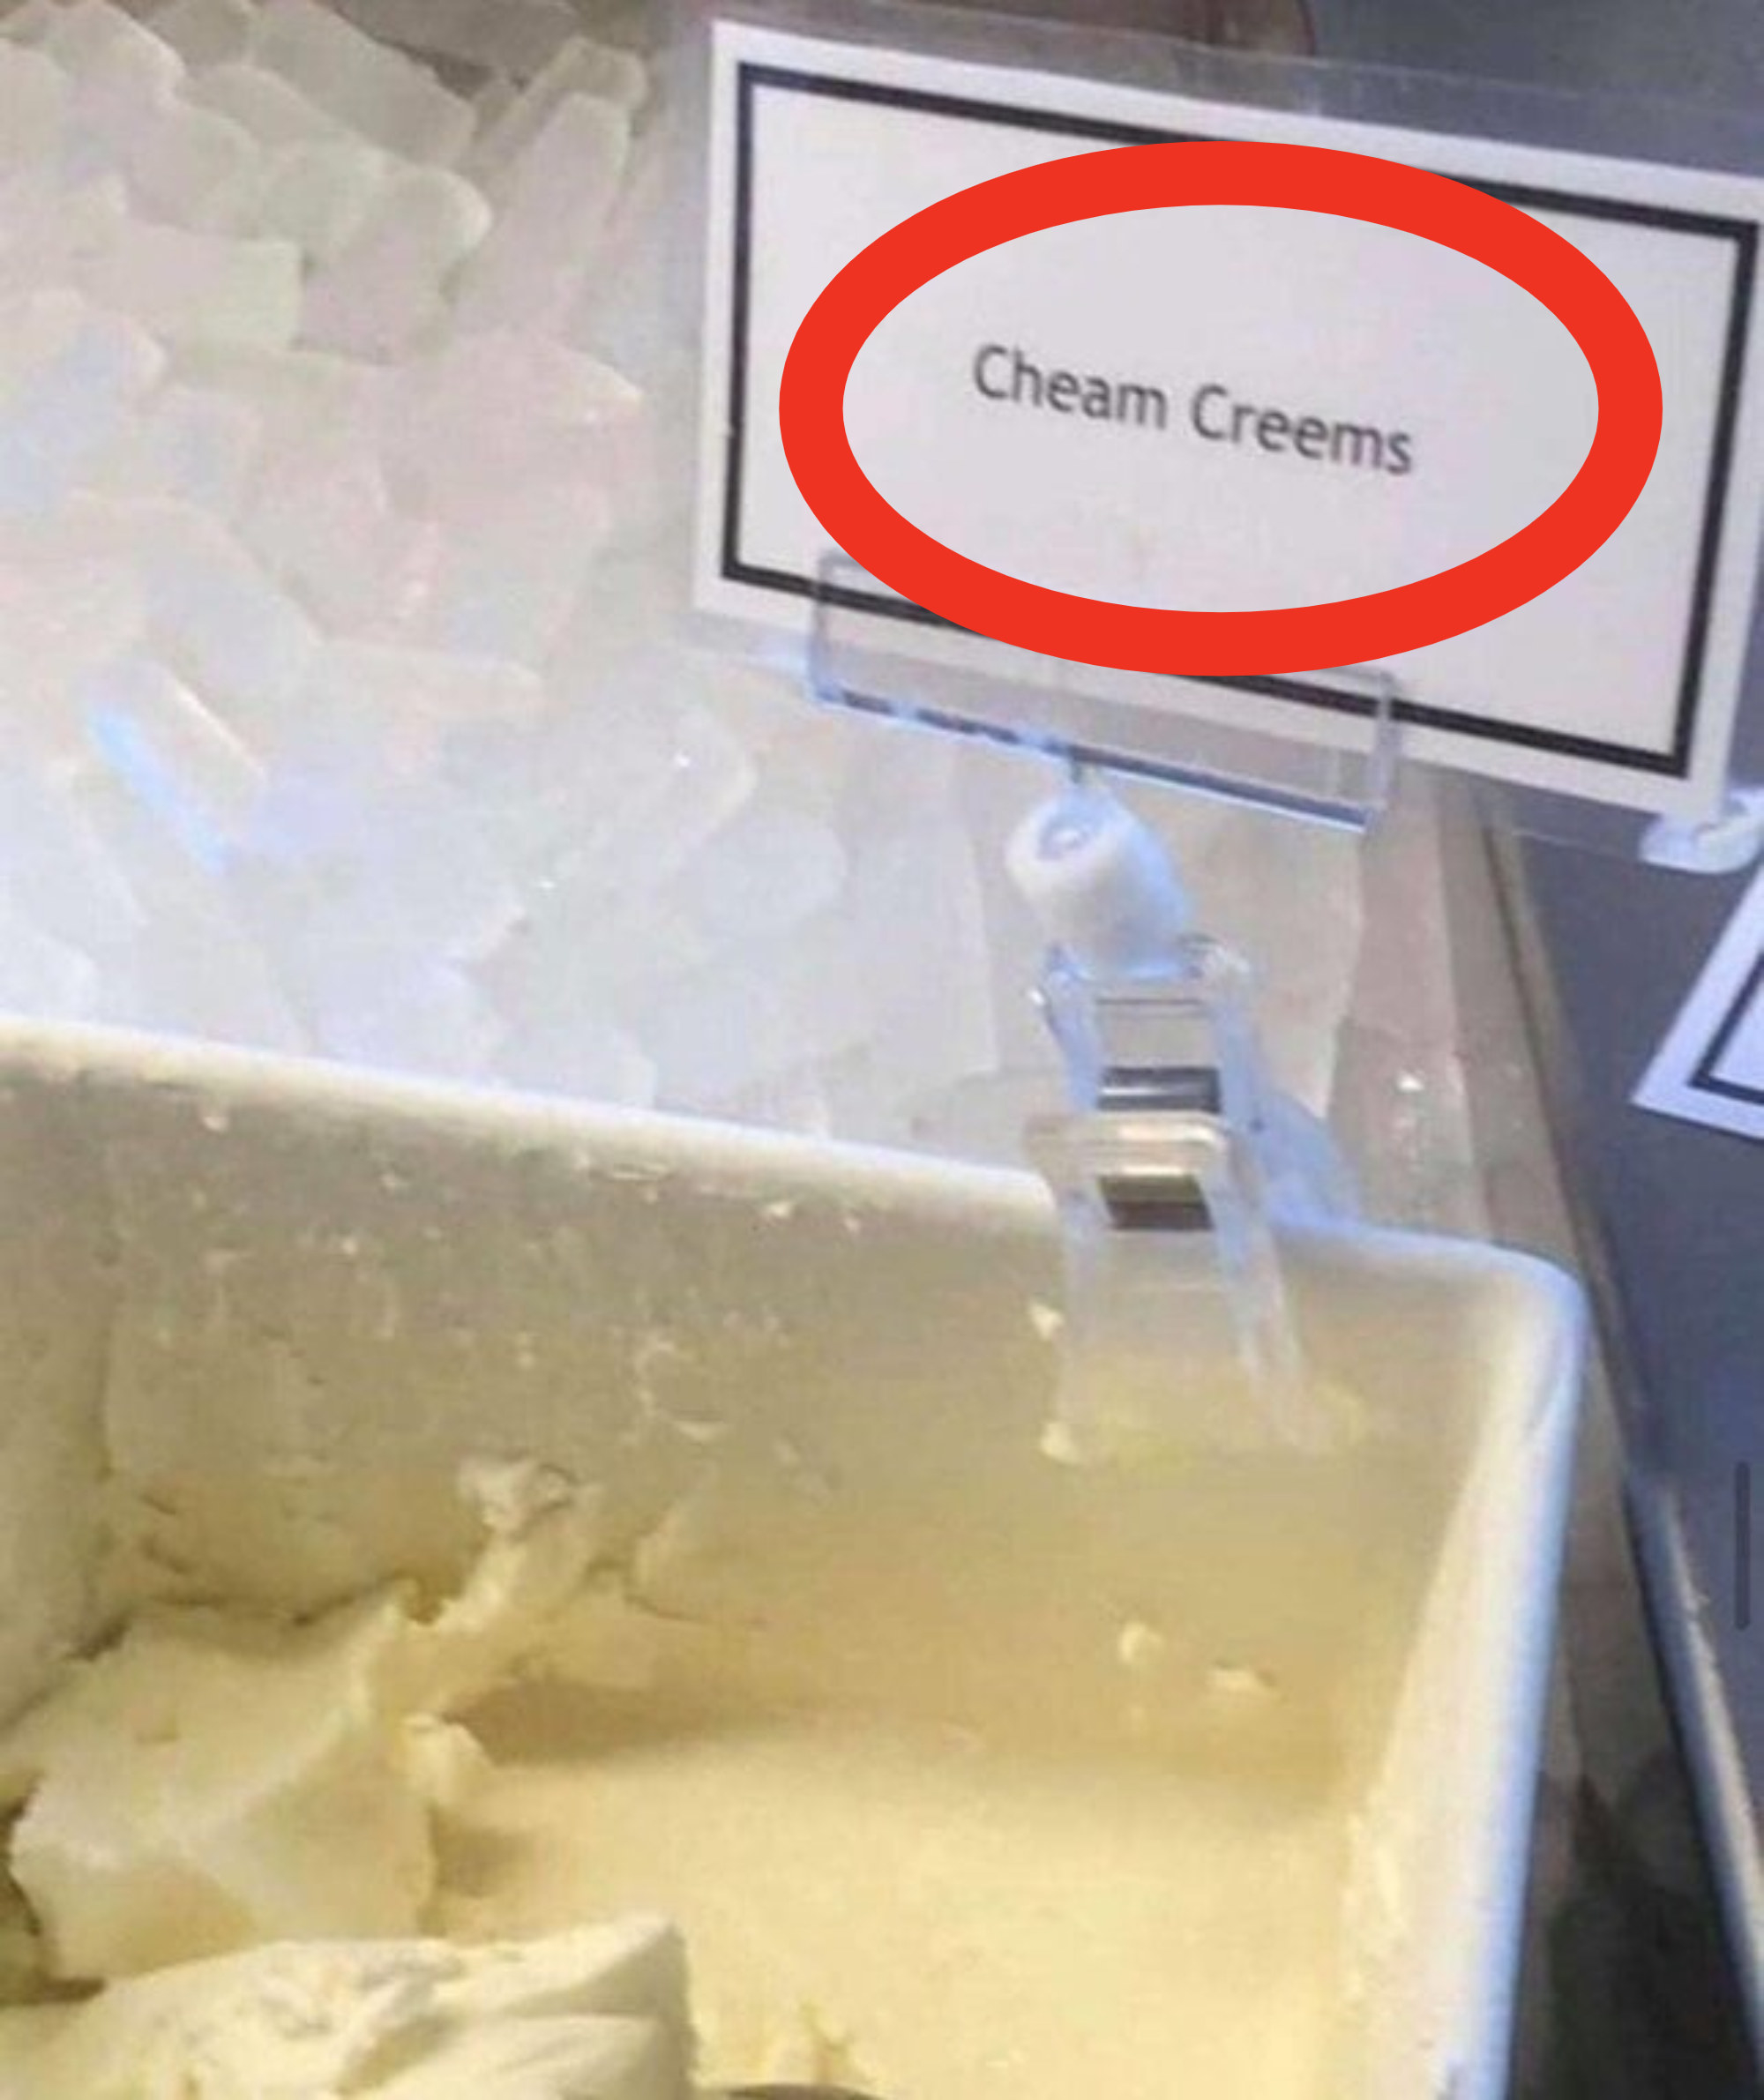 cream cheese label reading cheem creams